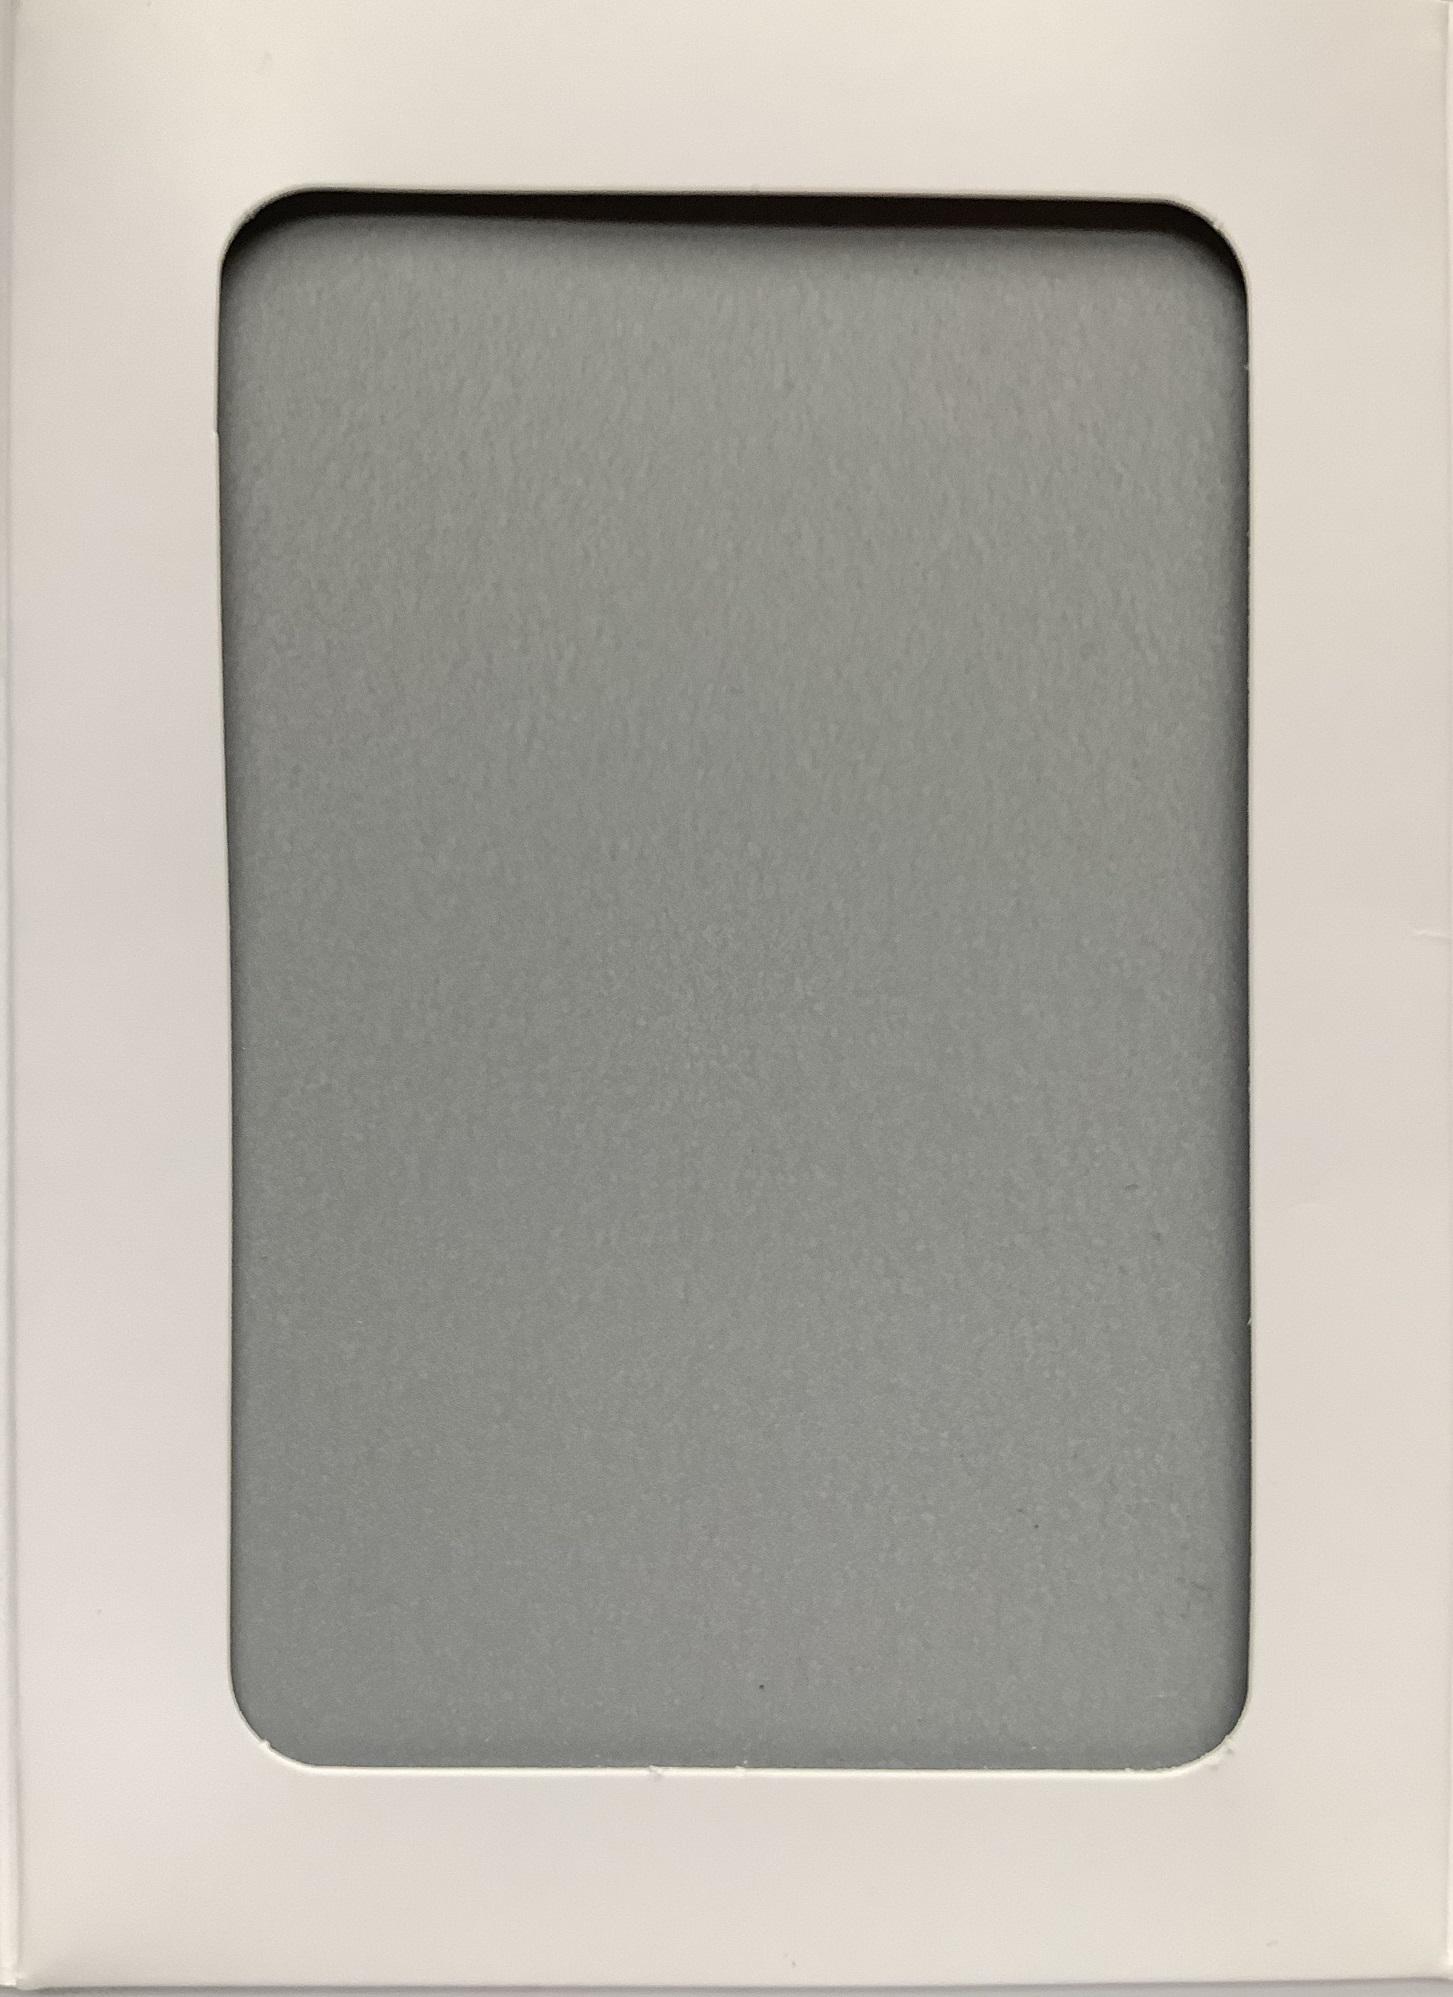 Mycelipan® STS – 25mm x 425mm Snap Together Seam Panels – Greencoat PLX Pural BT – Quarry Grey